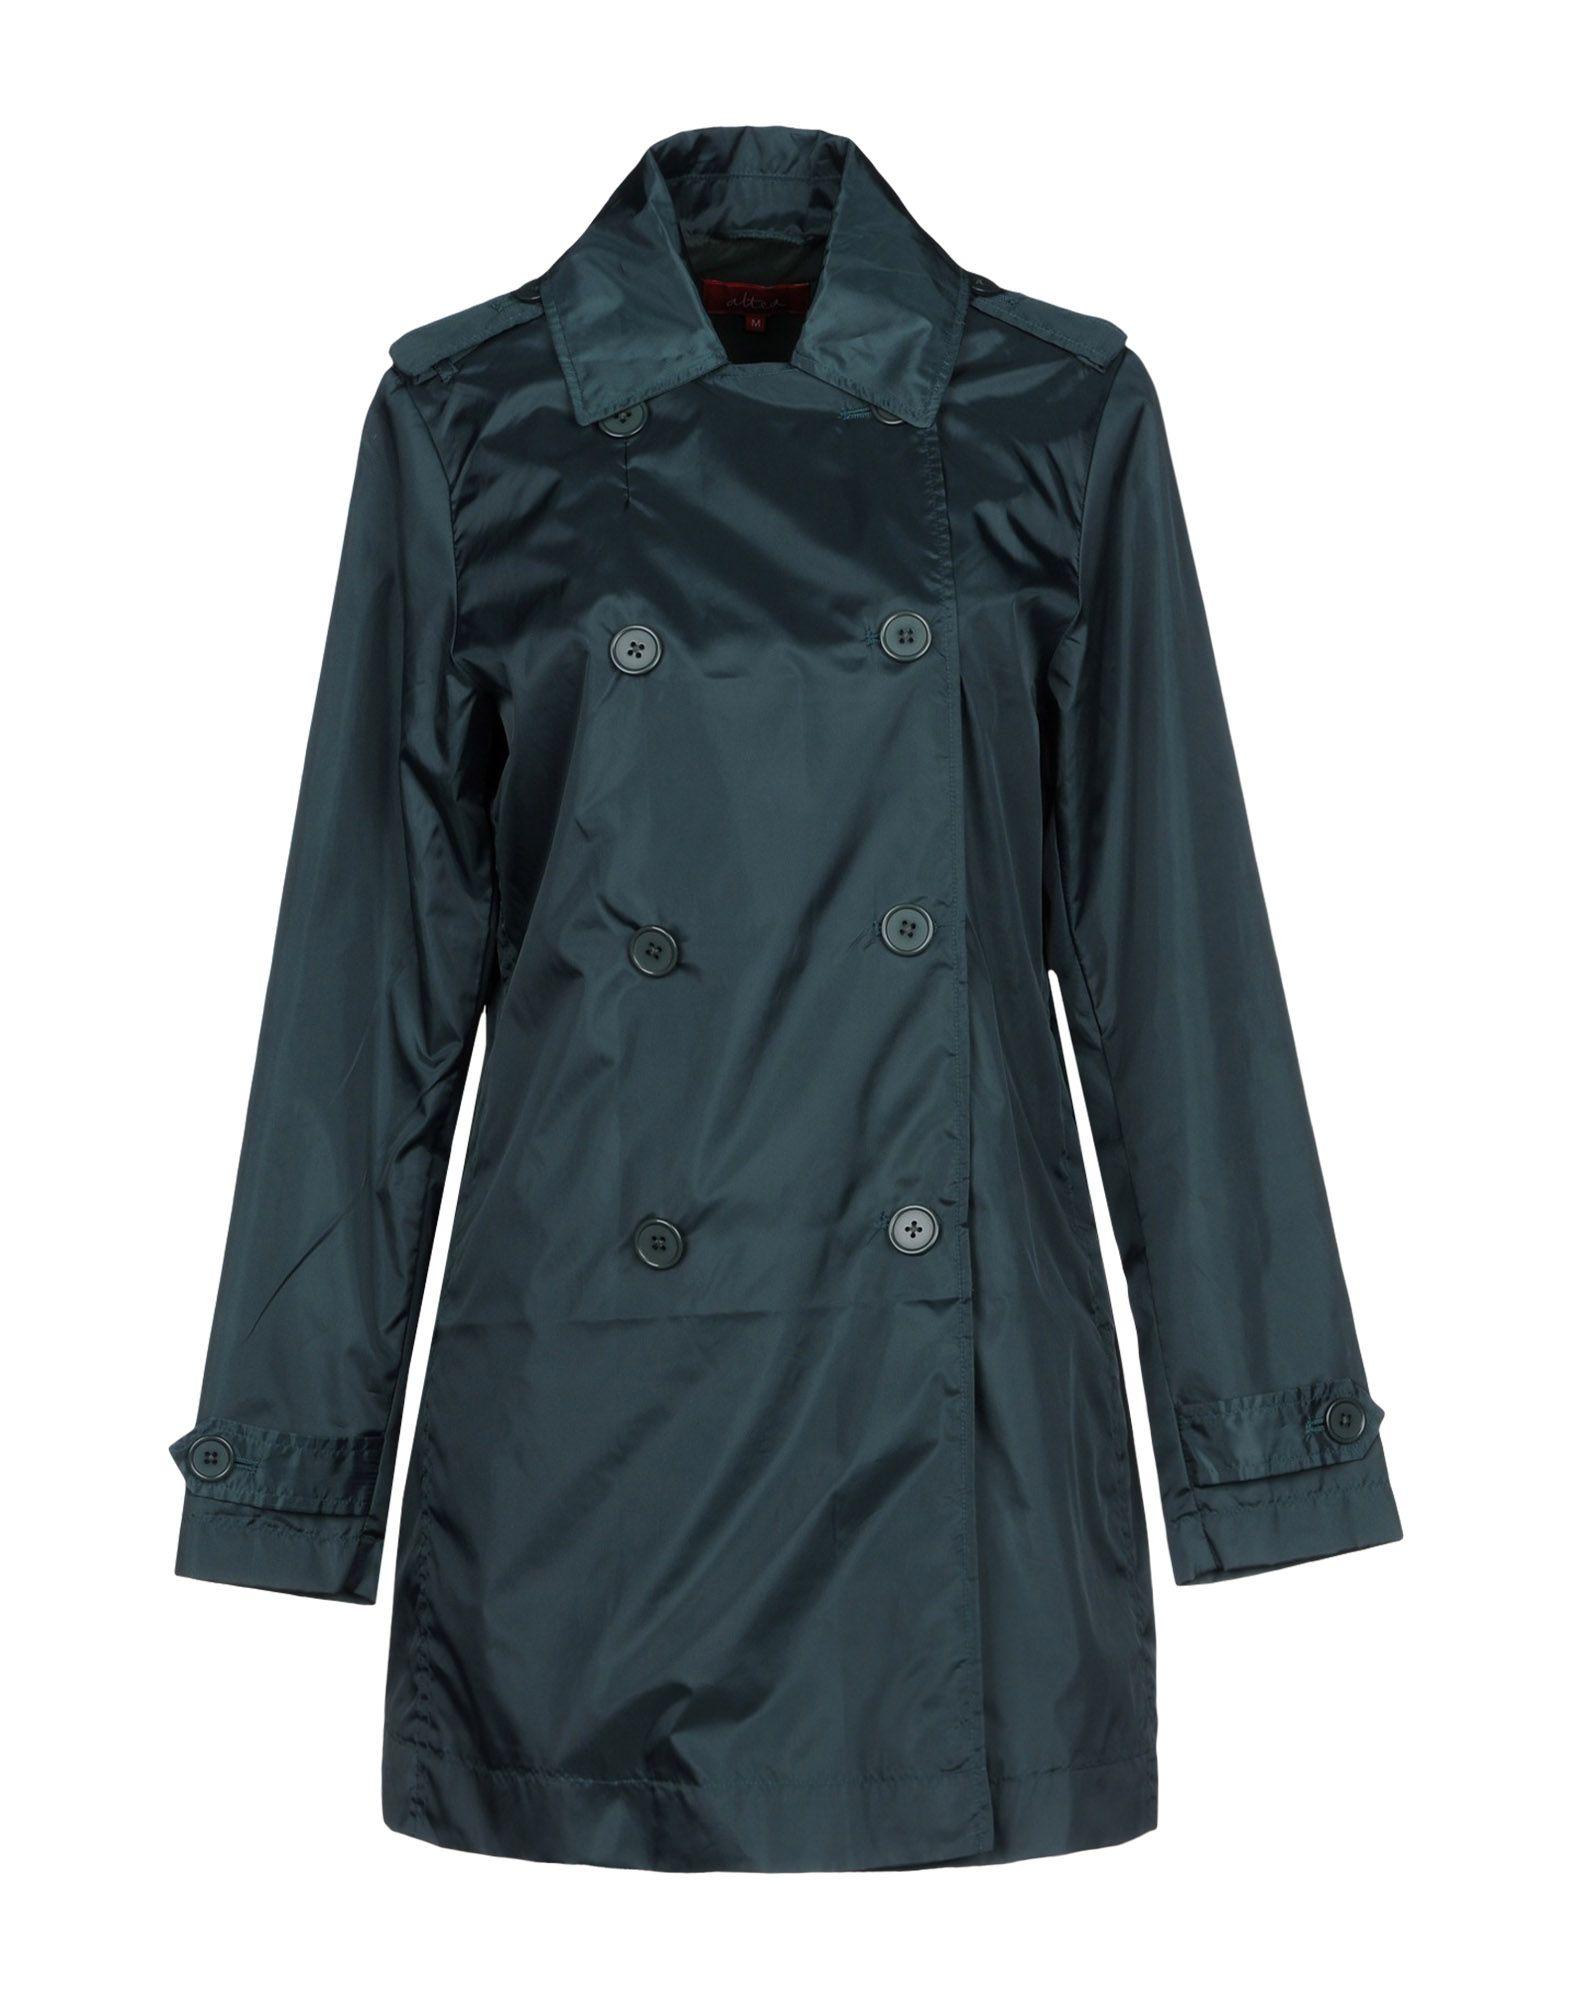 ALTEA dal 1973 Легкое пальто dal dosso® перчатки